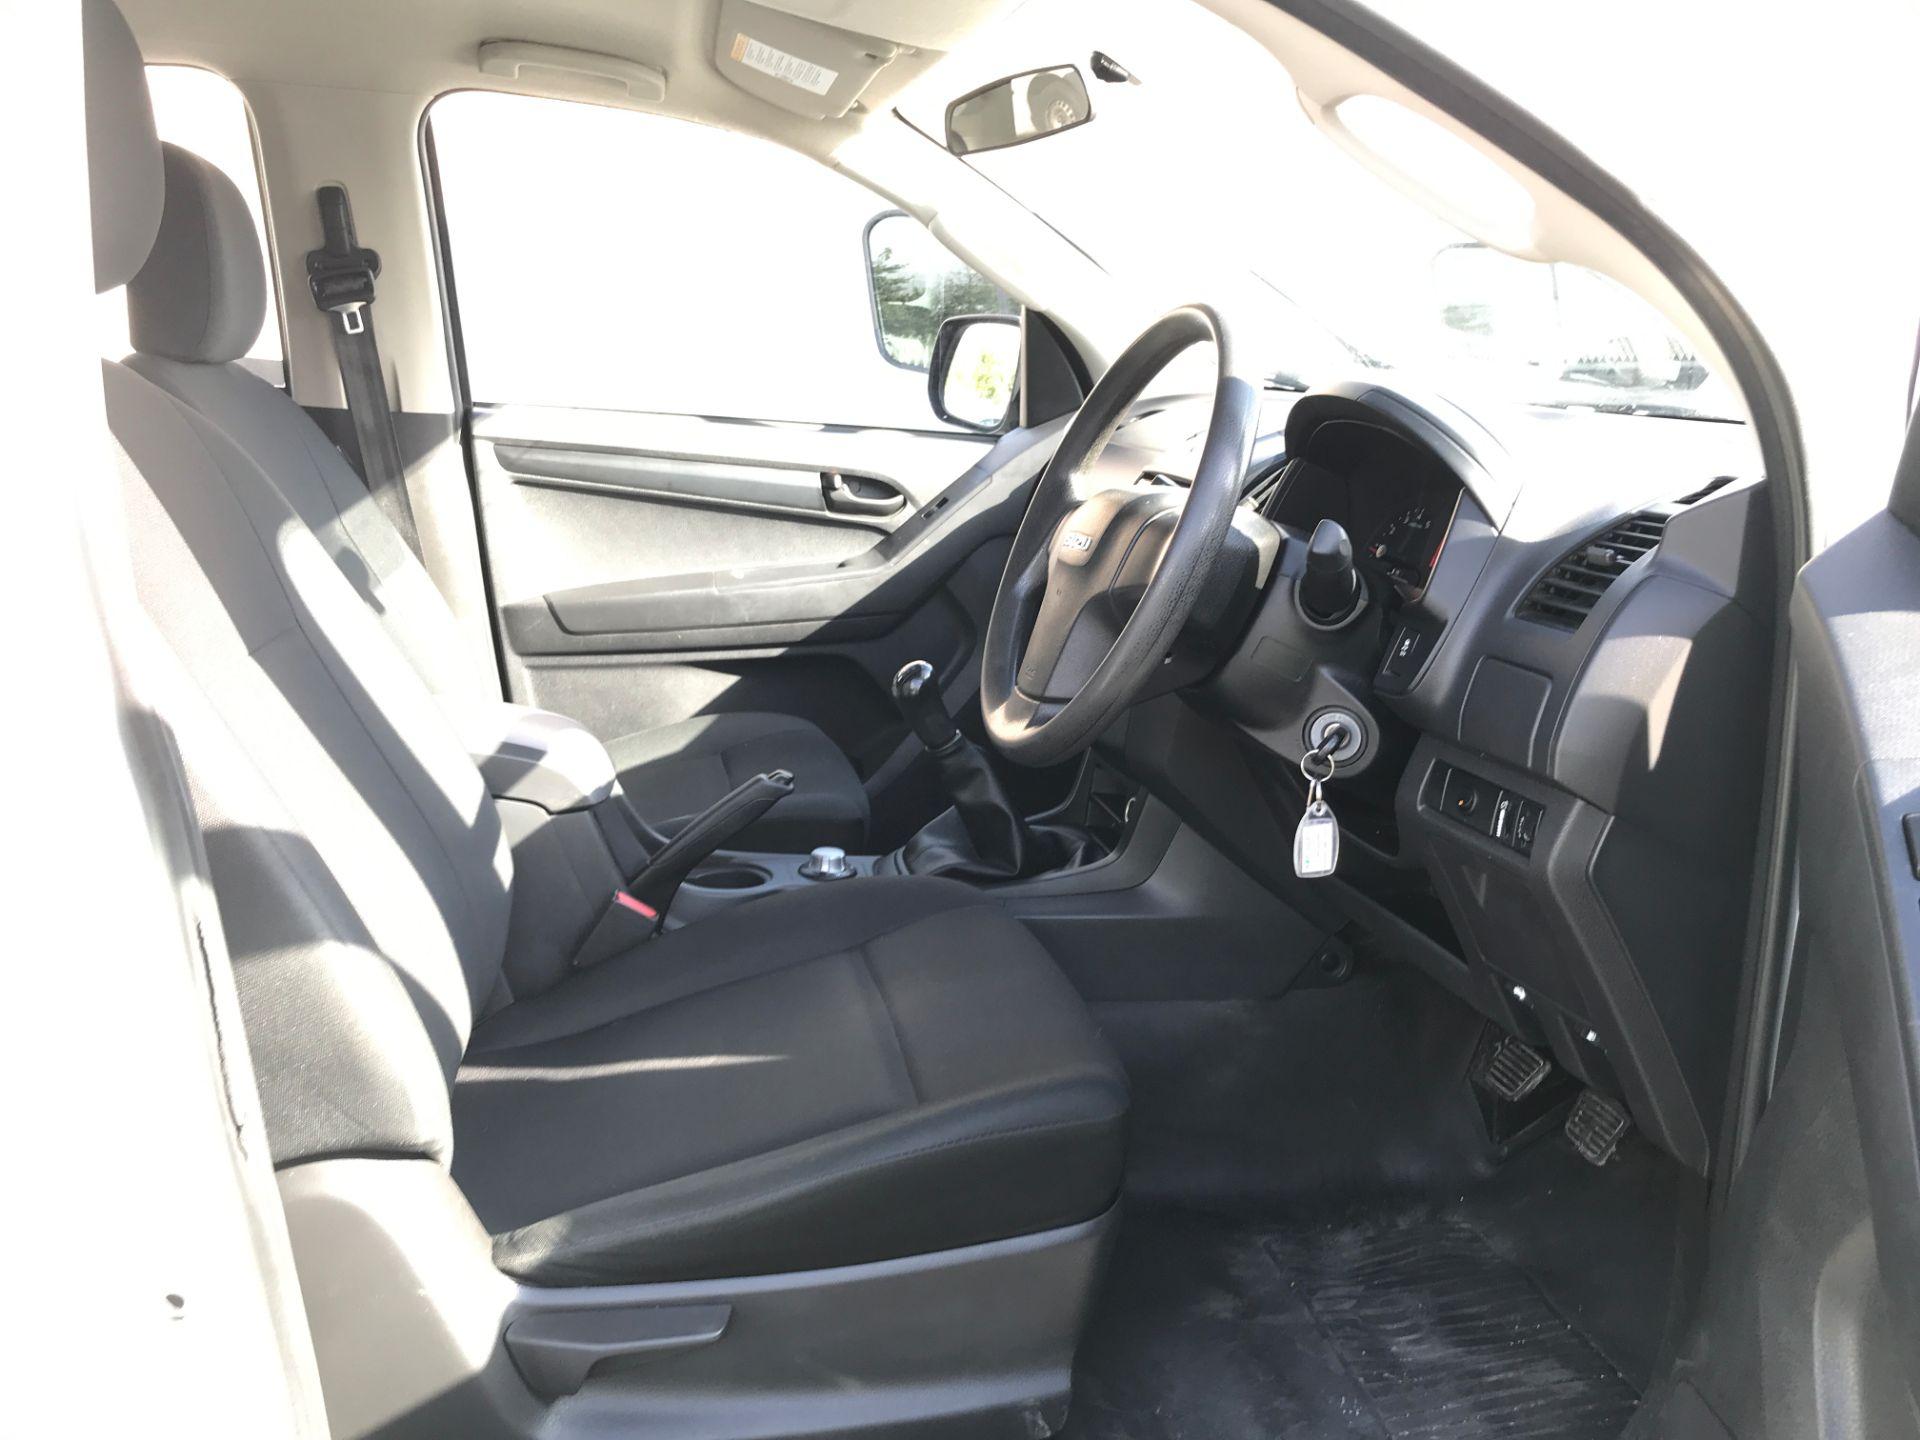 2015 Isuzu D-Max DOUBLE CAB 4X4 2.5TD 163PS EURO 5, AIR CON (YB65DJF) Image 2